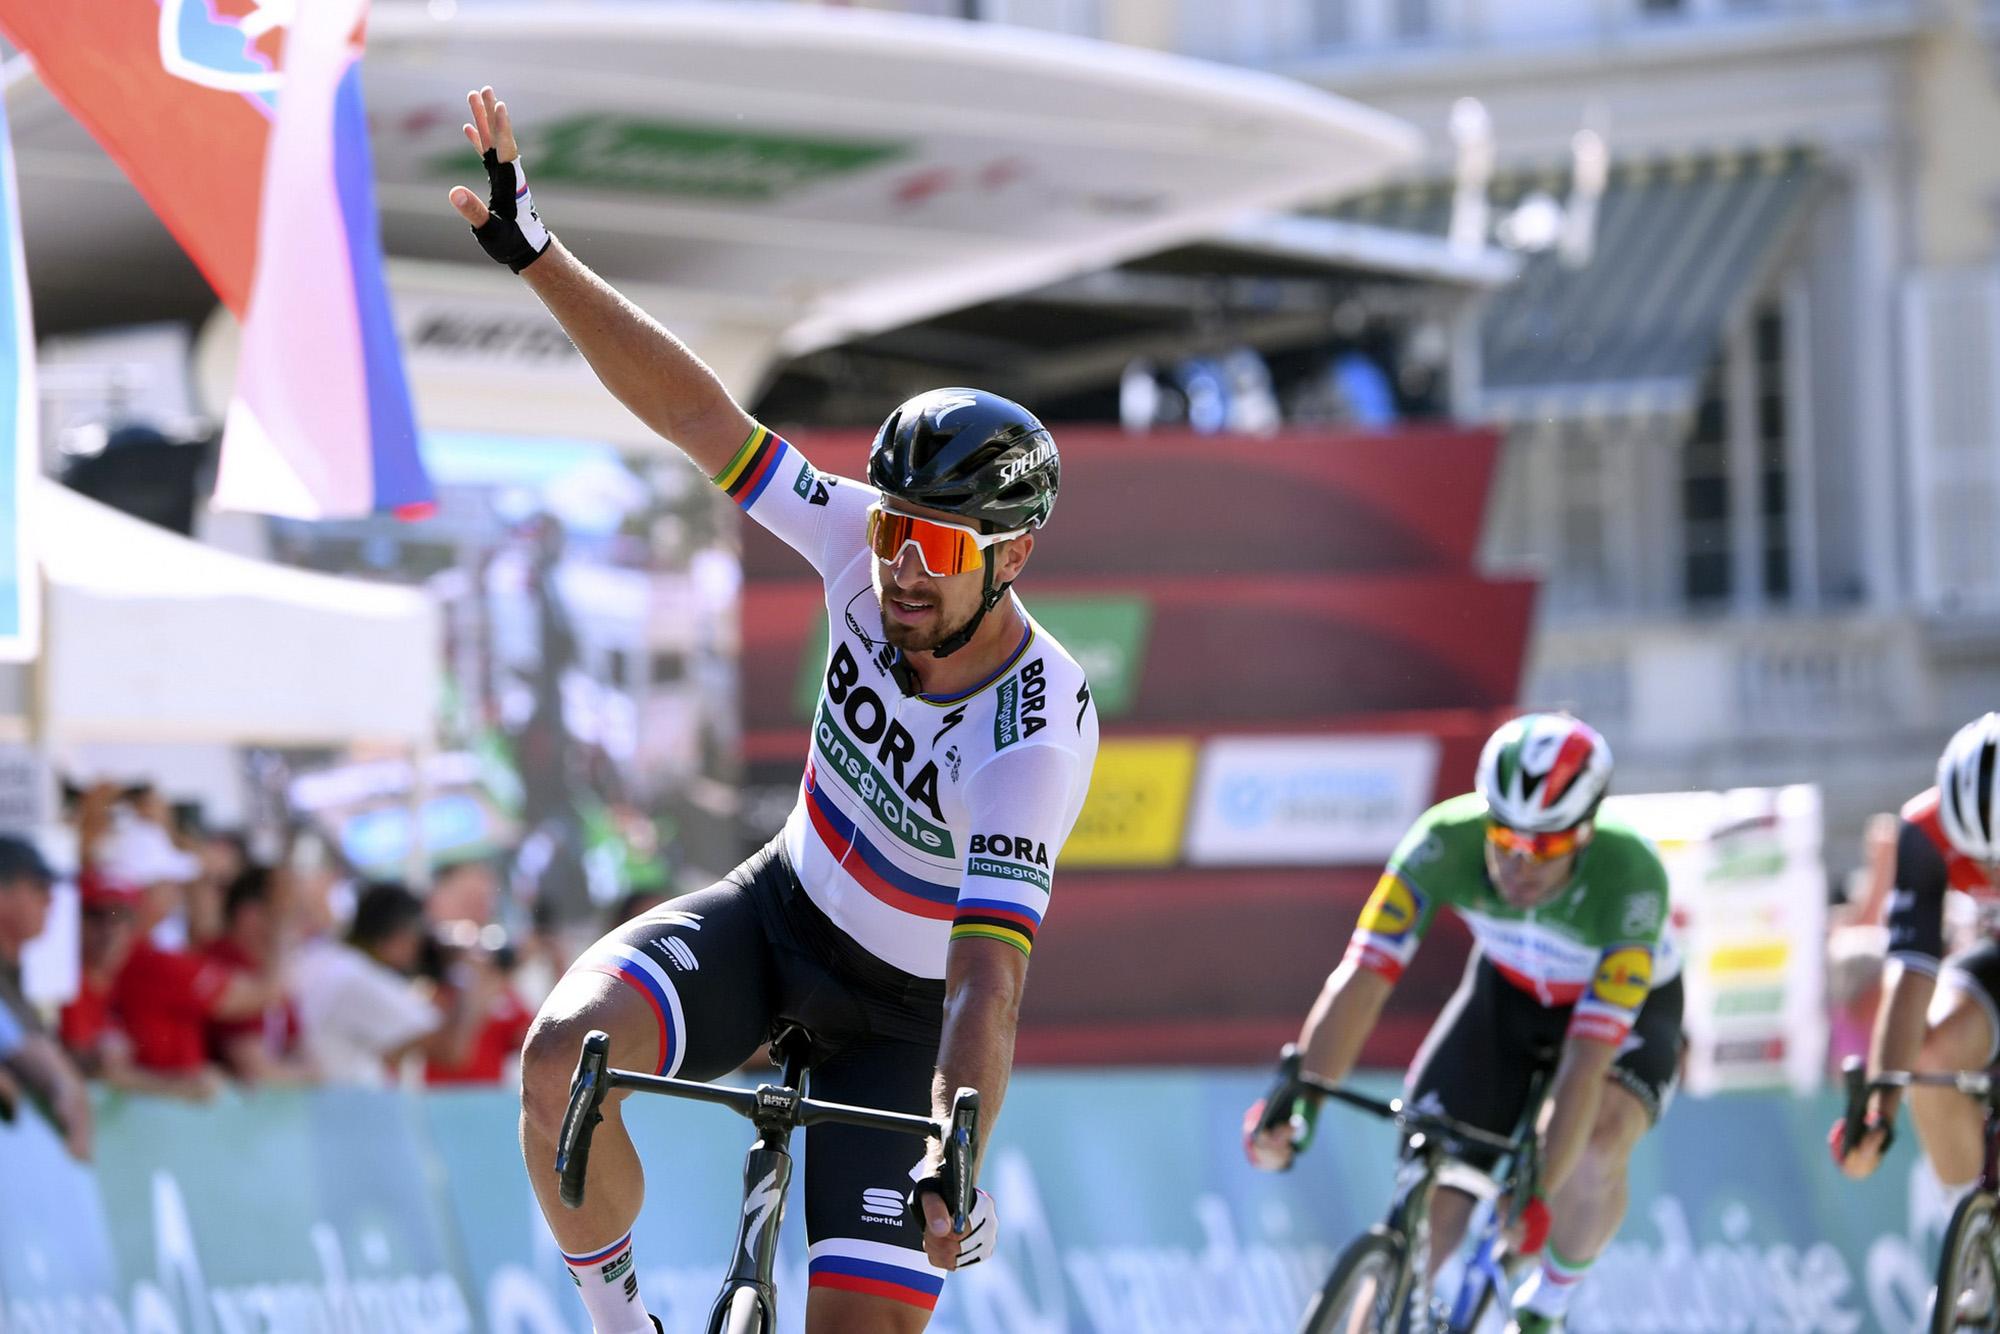 Tour de Suisse 2019 - 83rd Edition - 3rd stage Flamatt - Murten 162,3 km - 17/06/2019 - Peter Sagan (SVK - Bora - Hansgrohe) - photo Vincent Kalut/PN/BettiniPhoto©2019